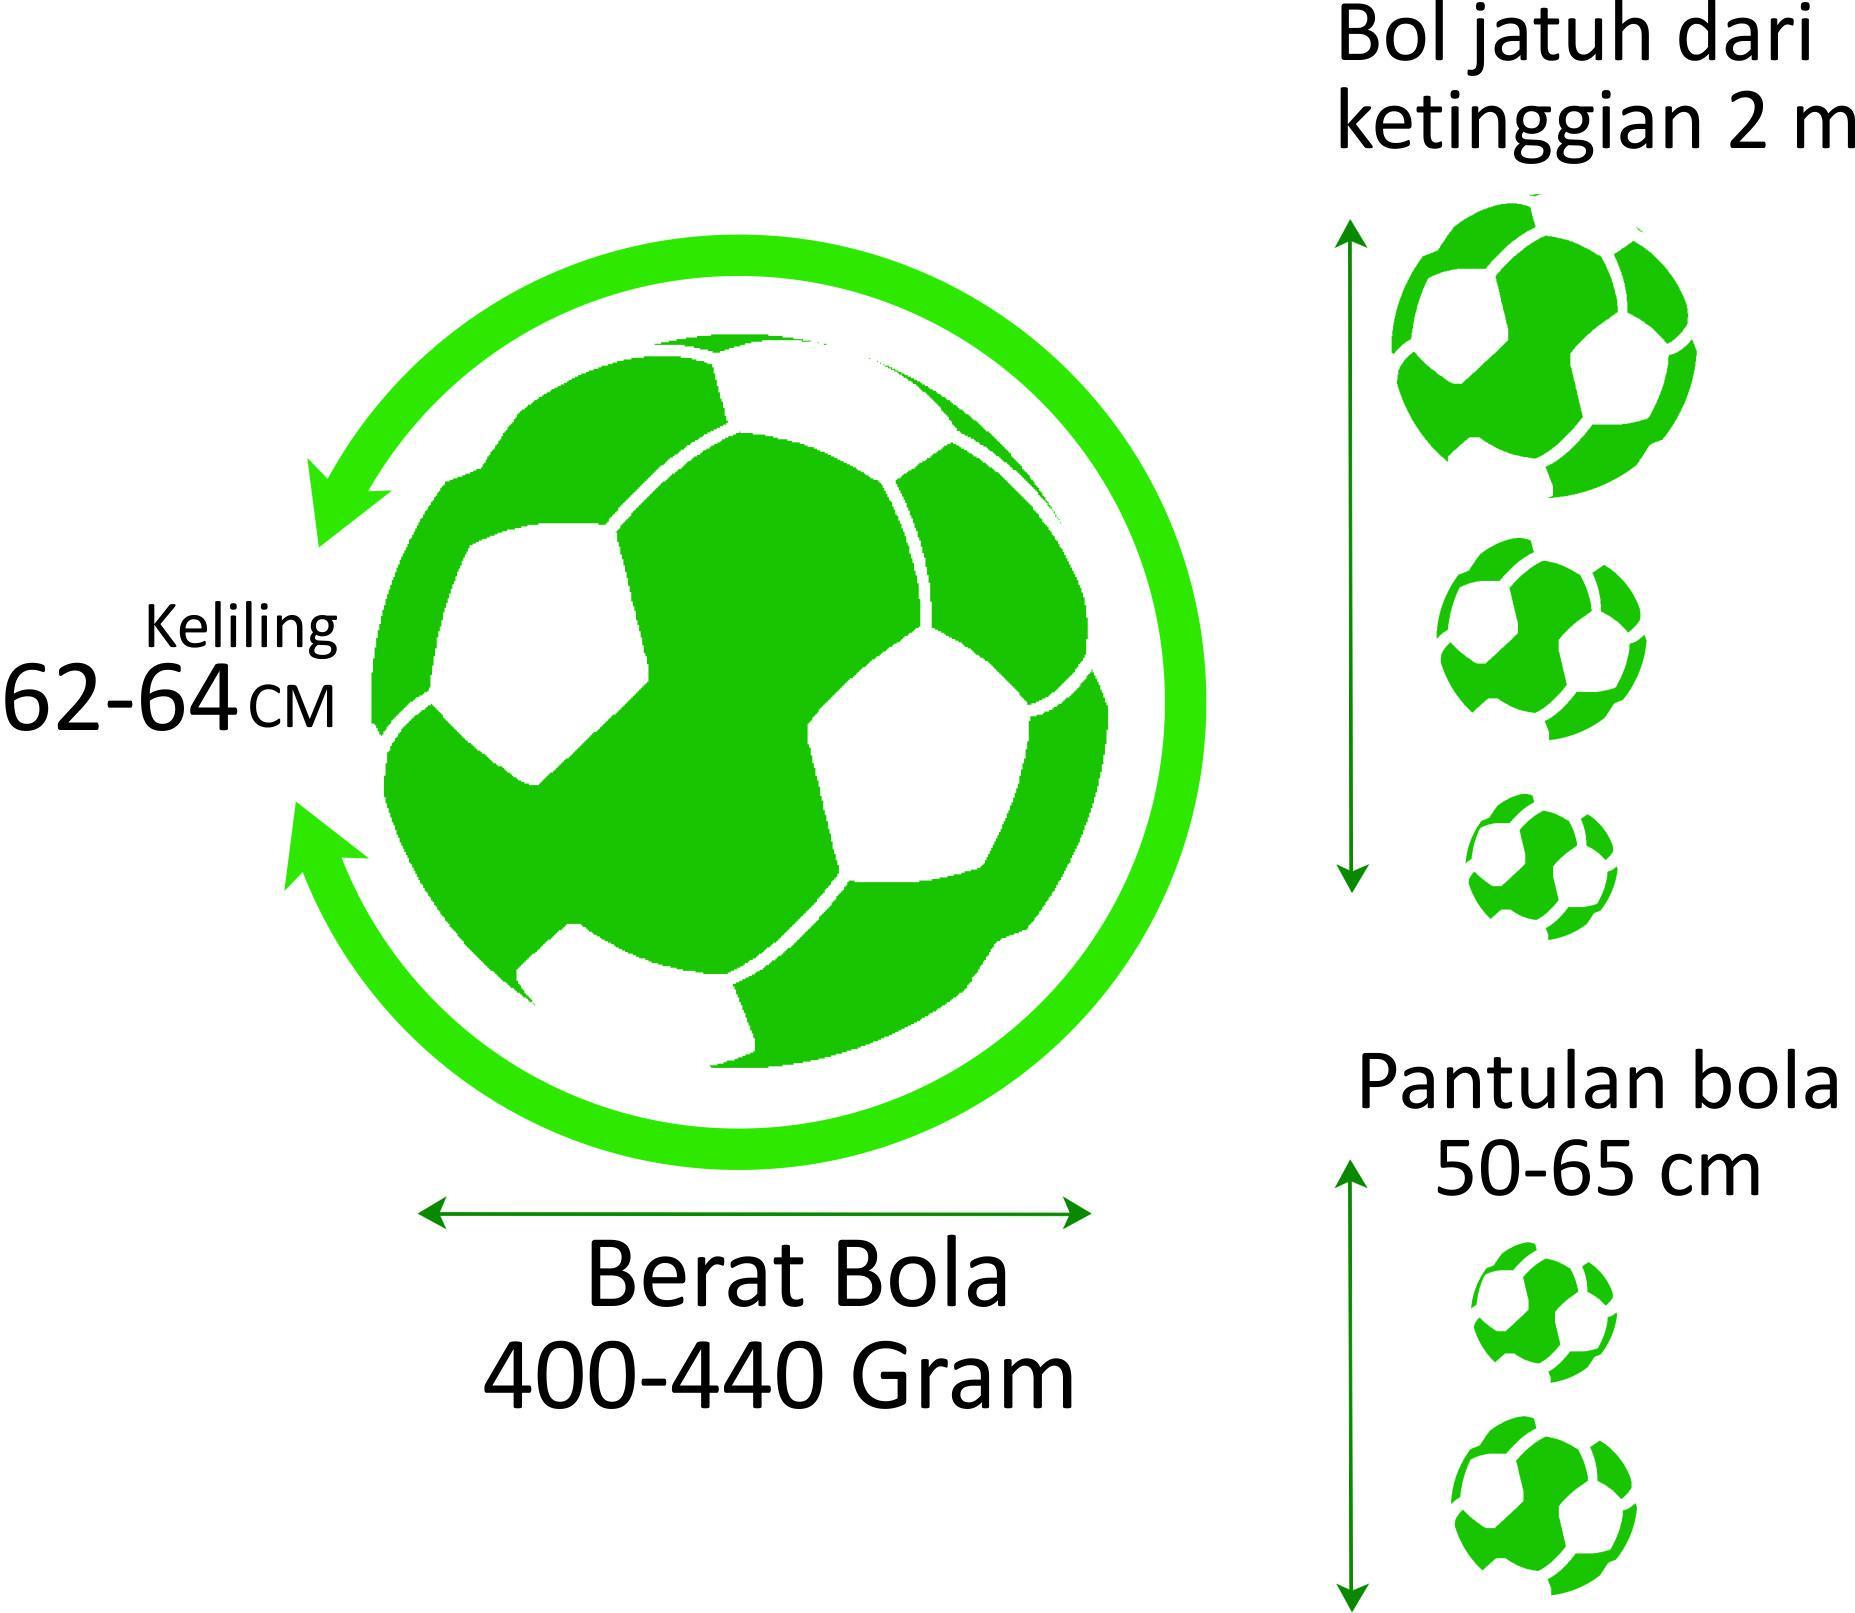 Peraturan Futsal (Bola). Copyright: Grafis: Eli Suhaeli/INDOSPORT